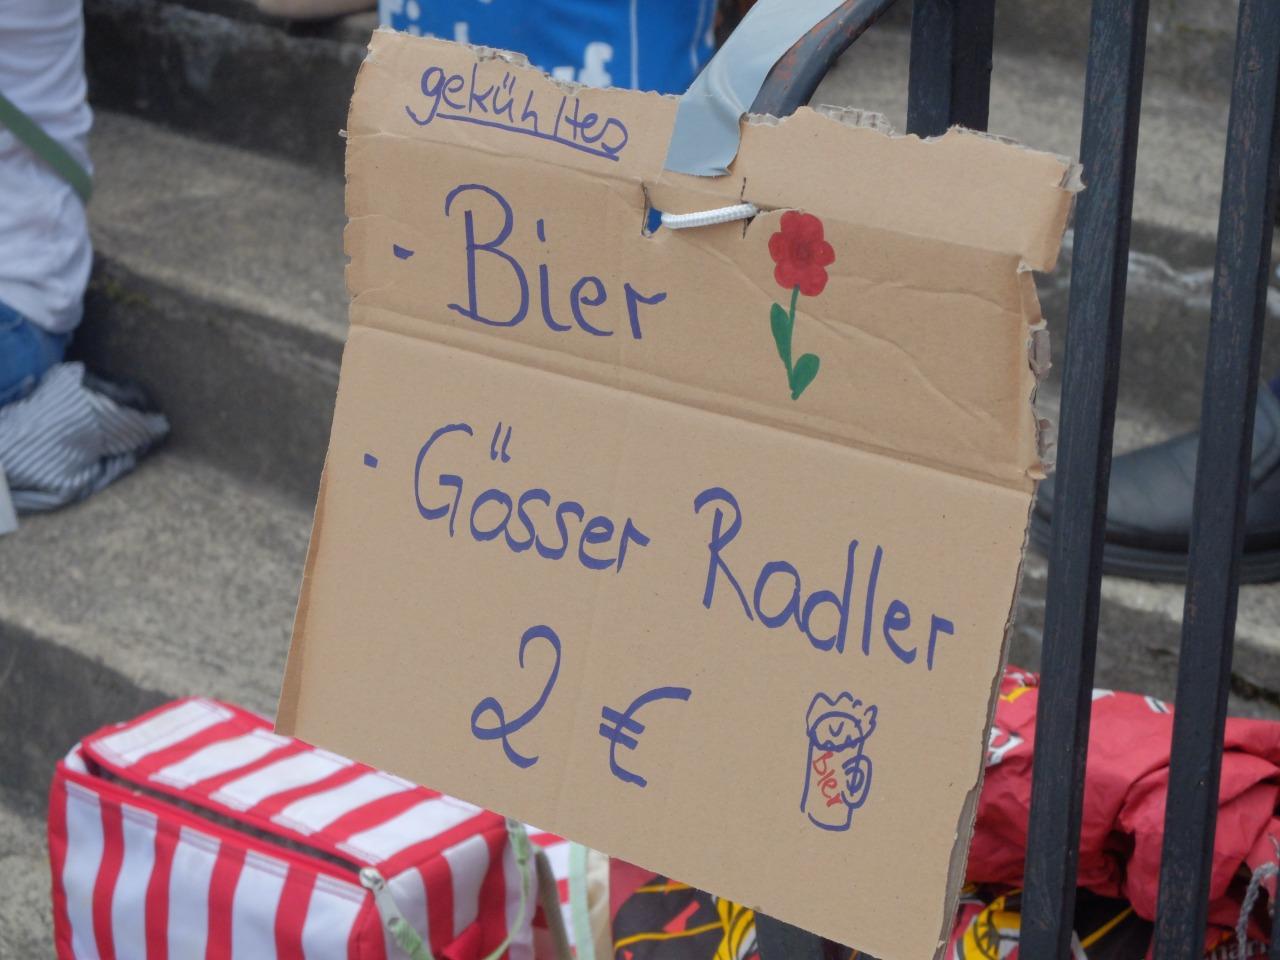 mangia minga - Gartenflohmarkt Solln